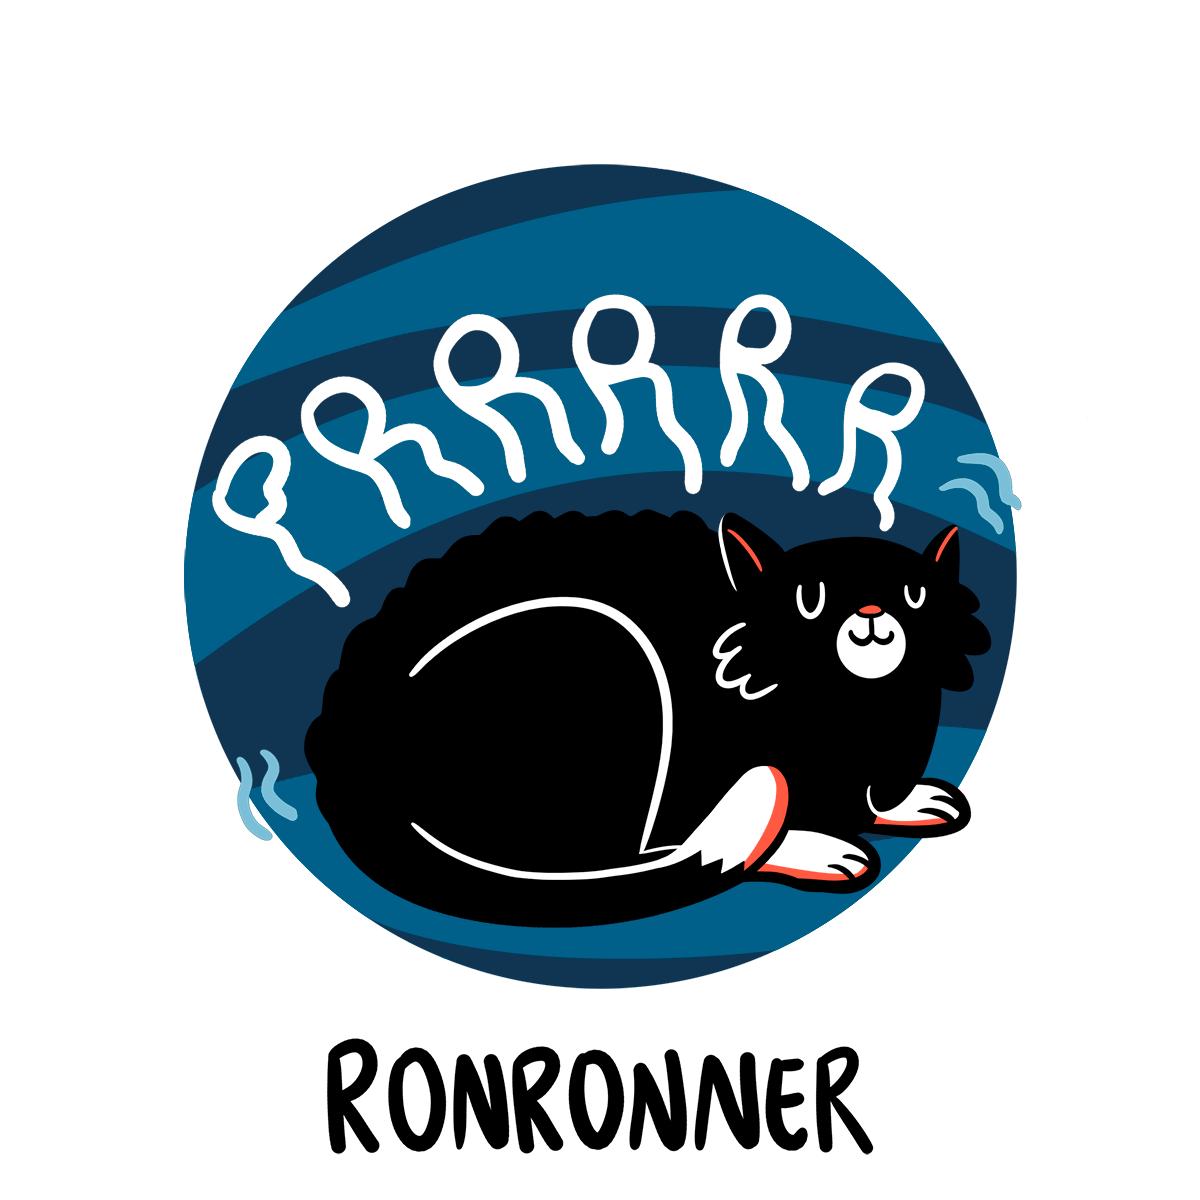 Ronronner